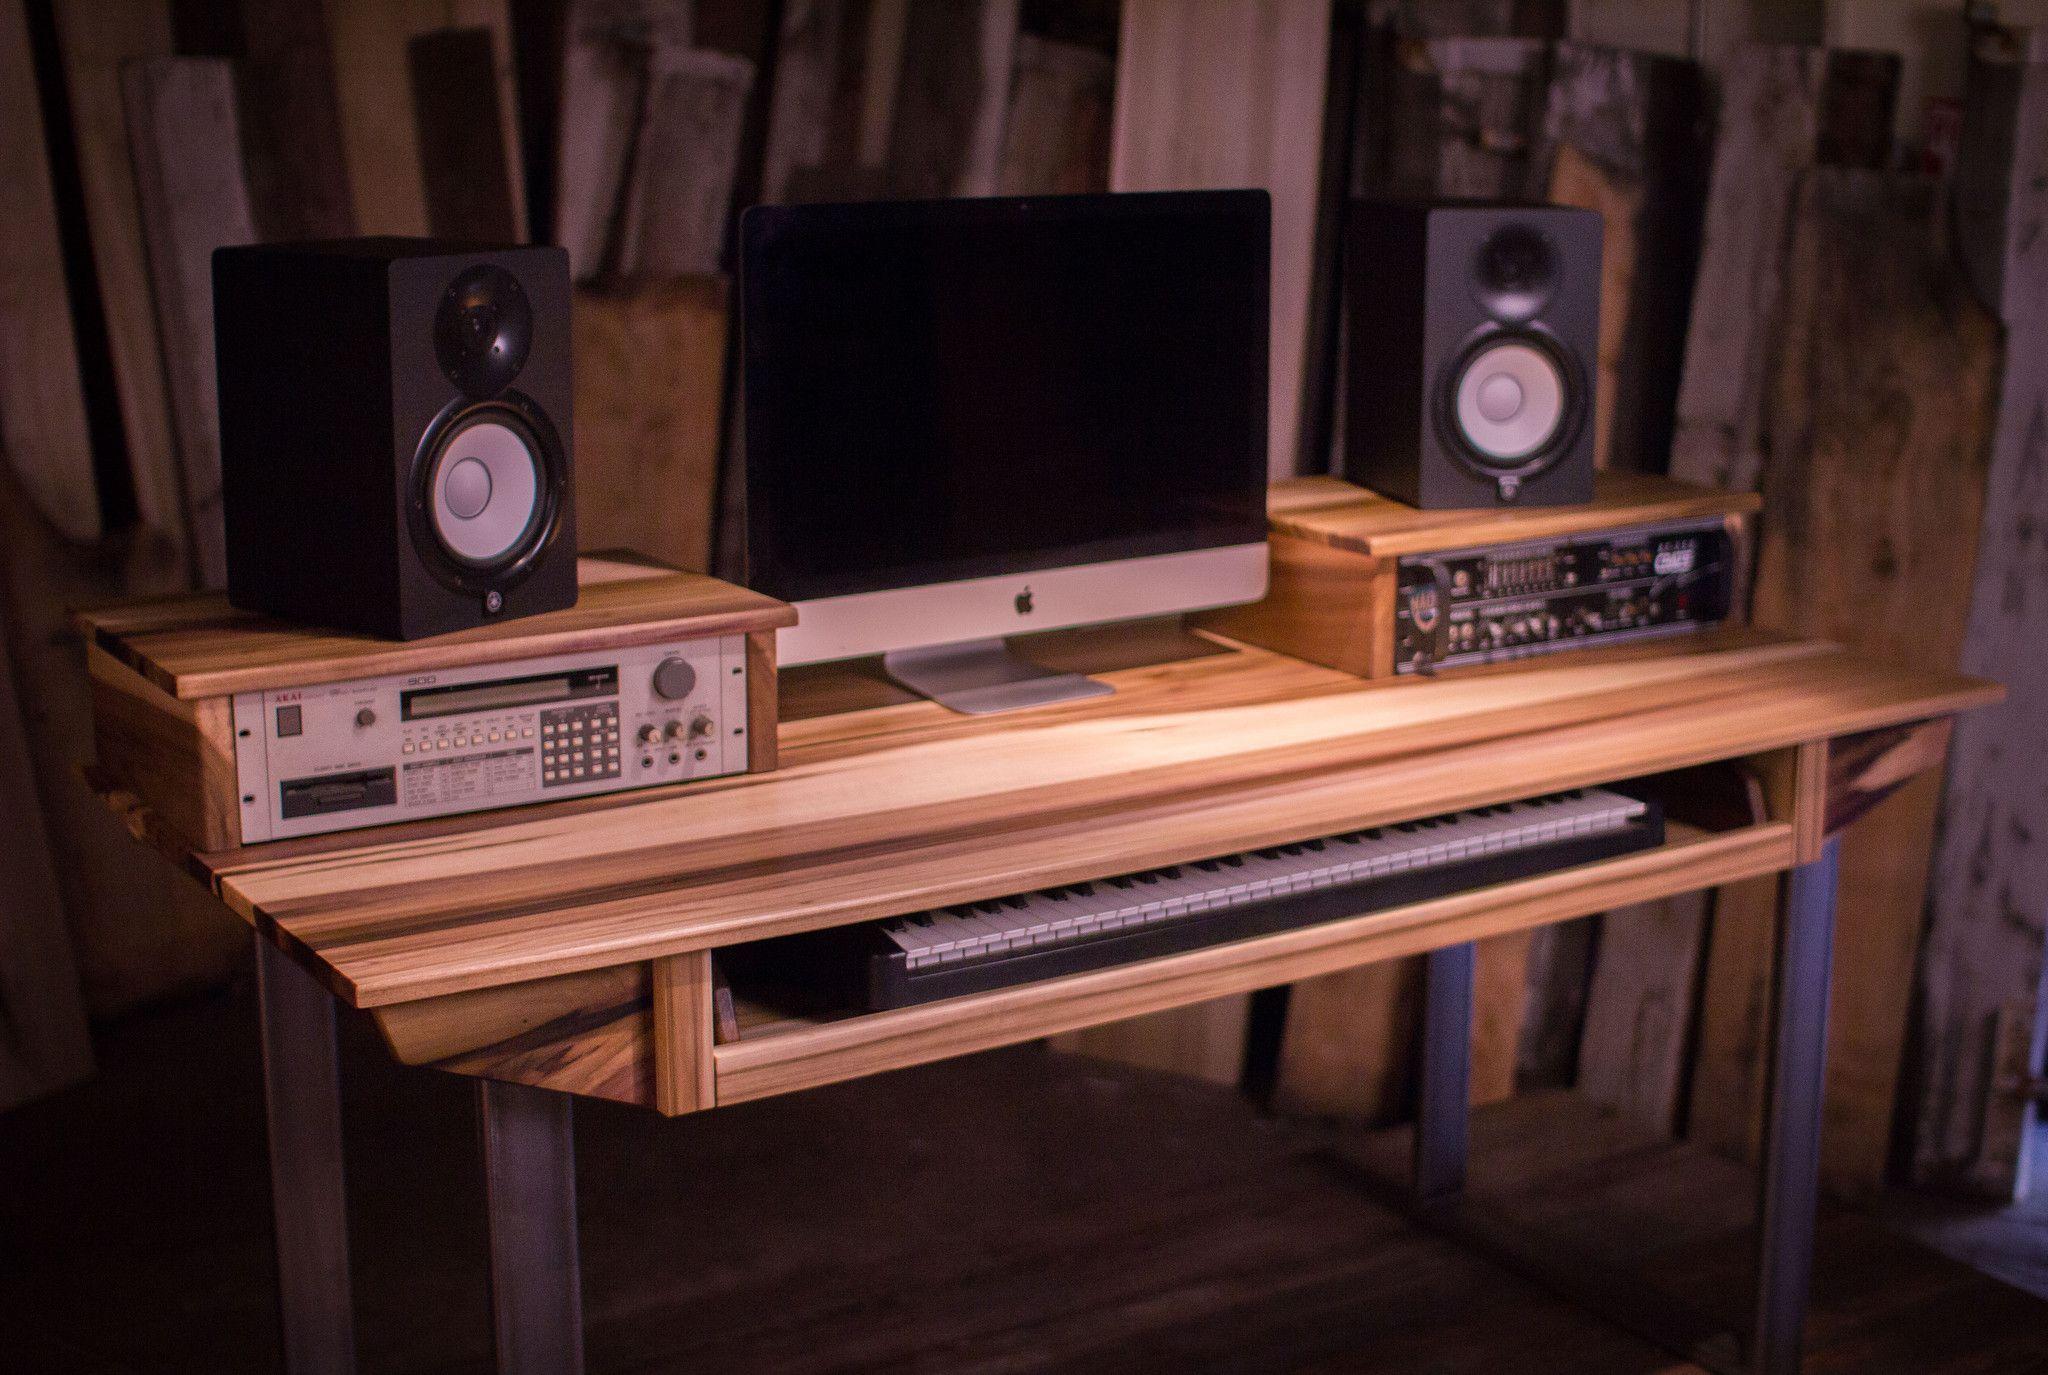 Mid size 61 key studio desk for audio video music film